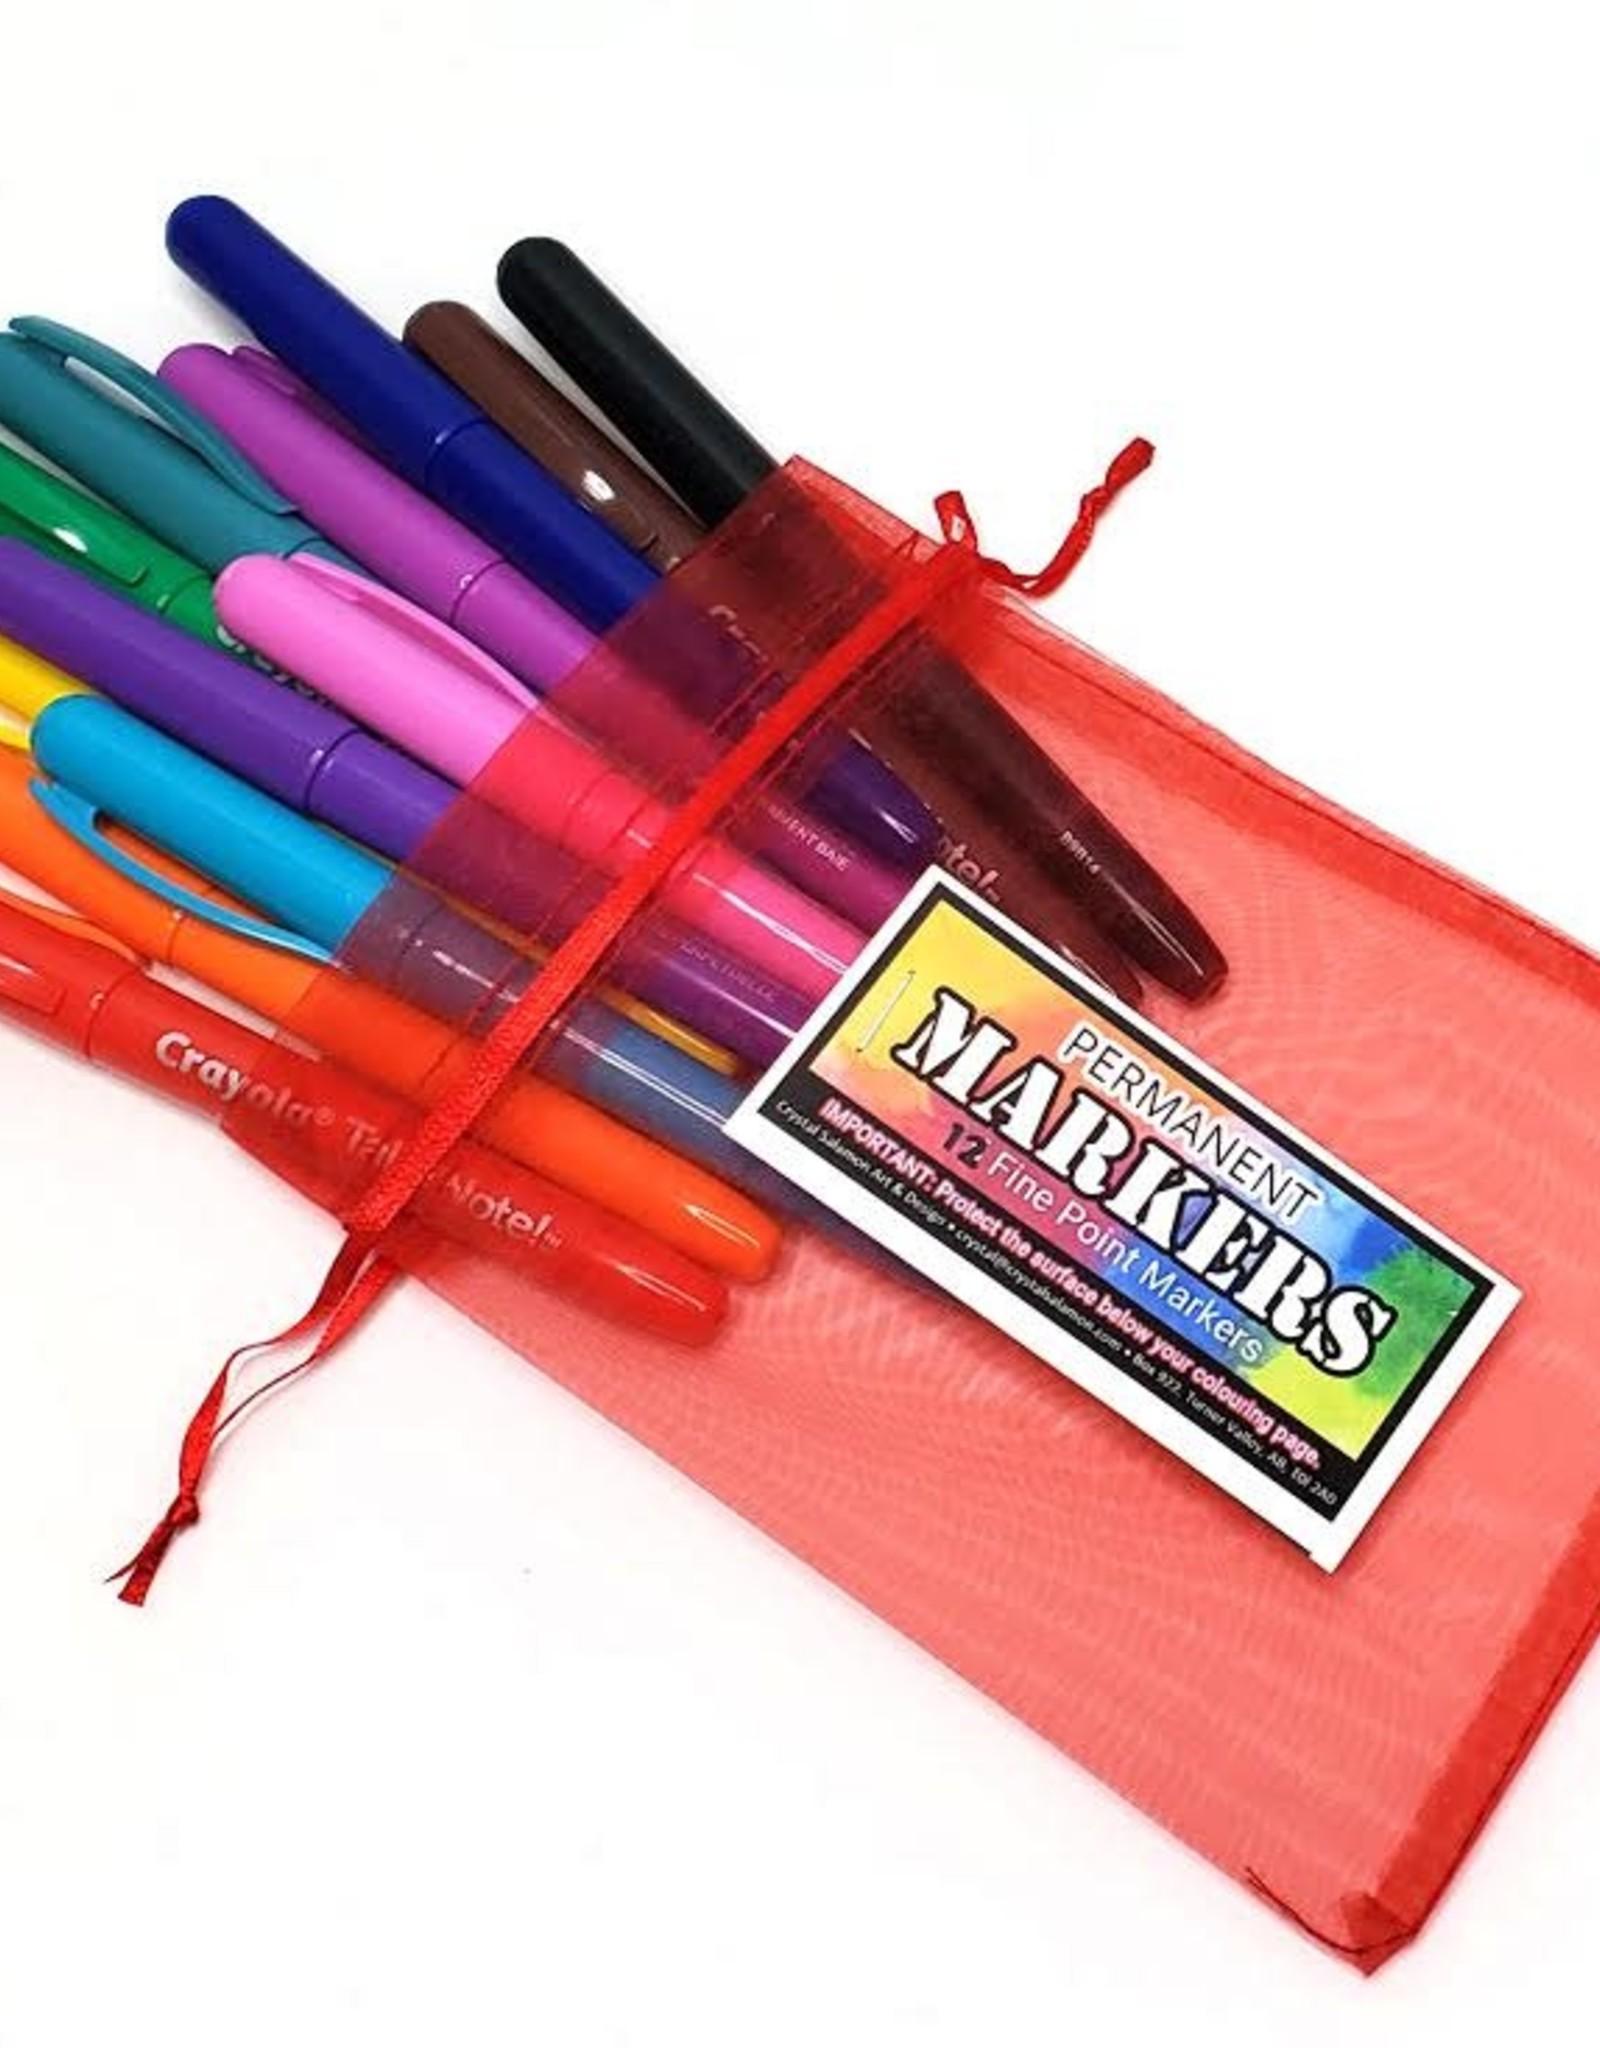 Crayola Marker Sets: 12 Crayola in  gift bag